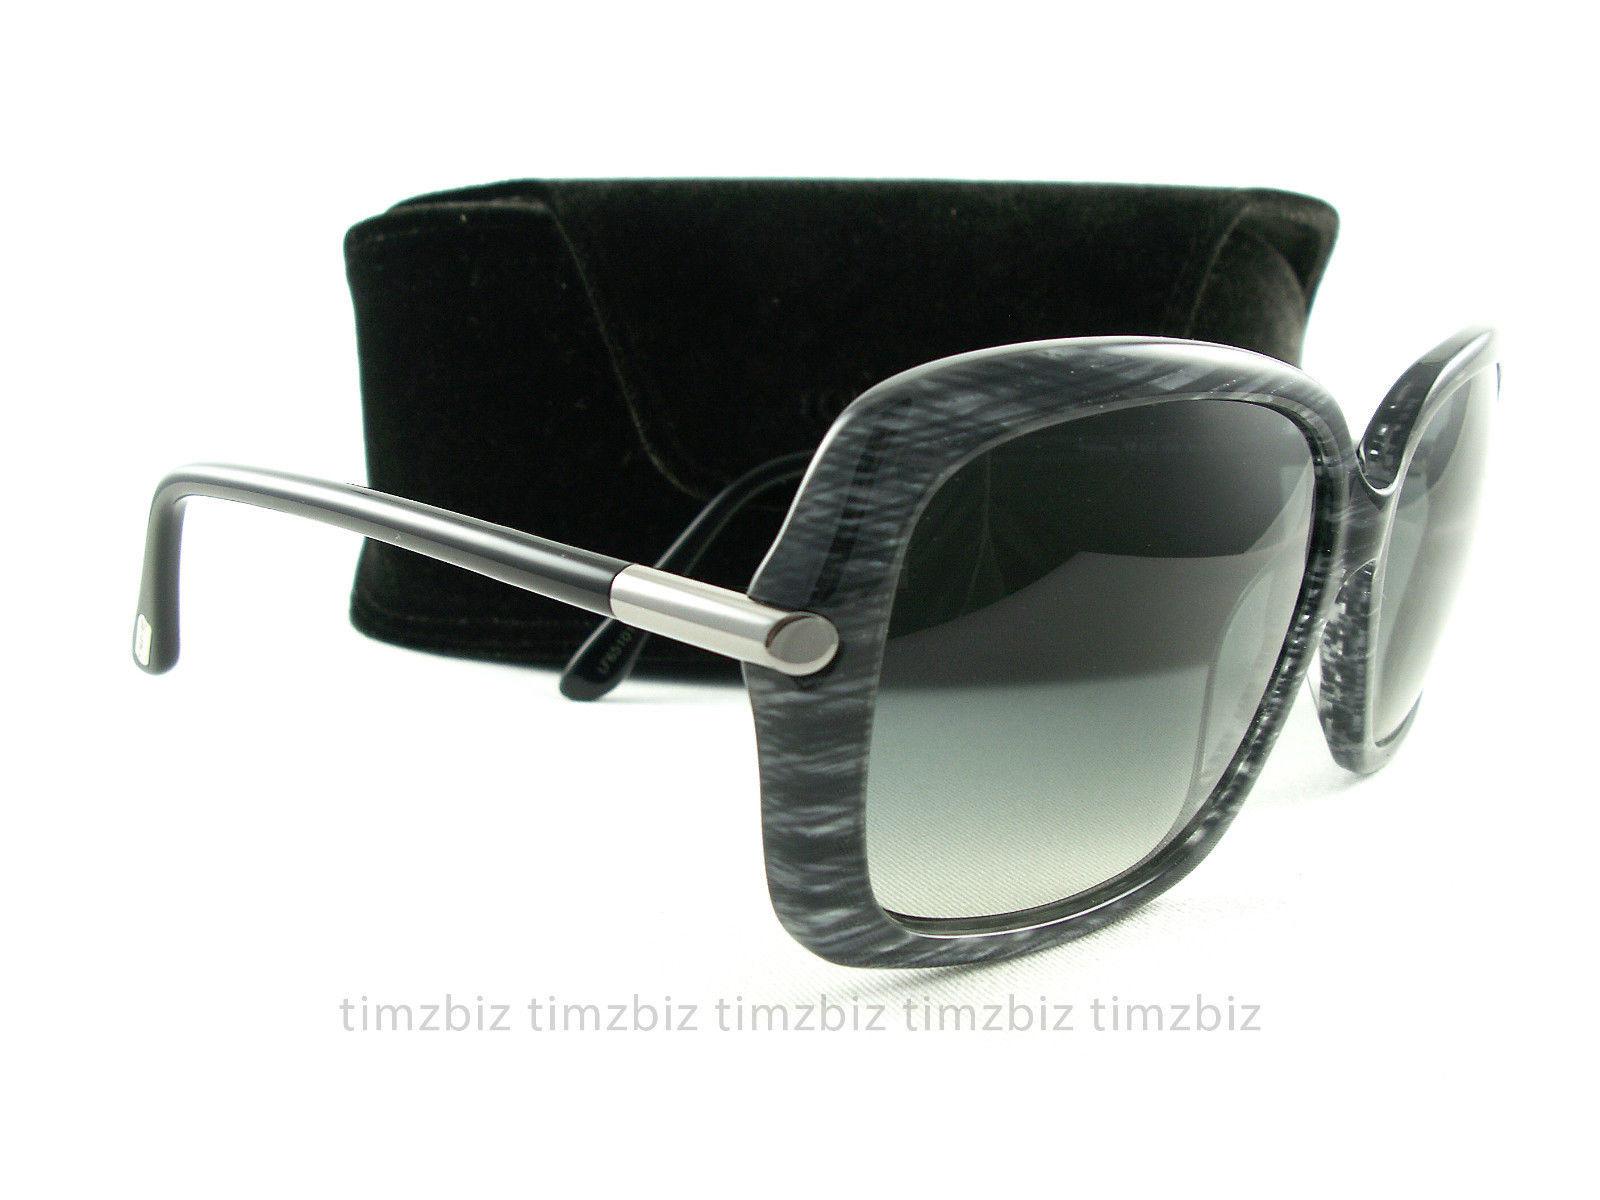 64162261d9 New Tom Ford Sunglasses TF 323 Paloma 05B and 50 similar items